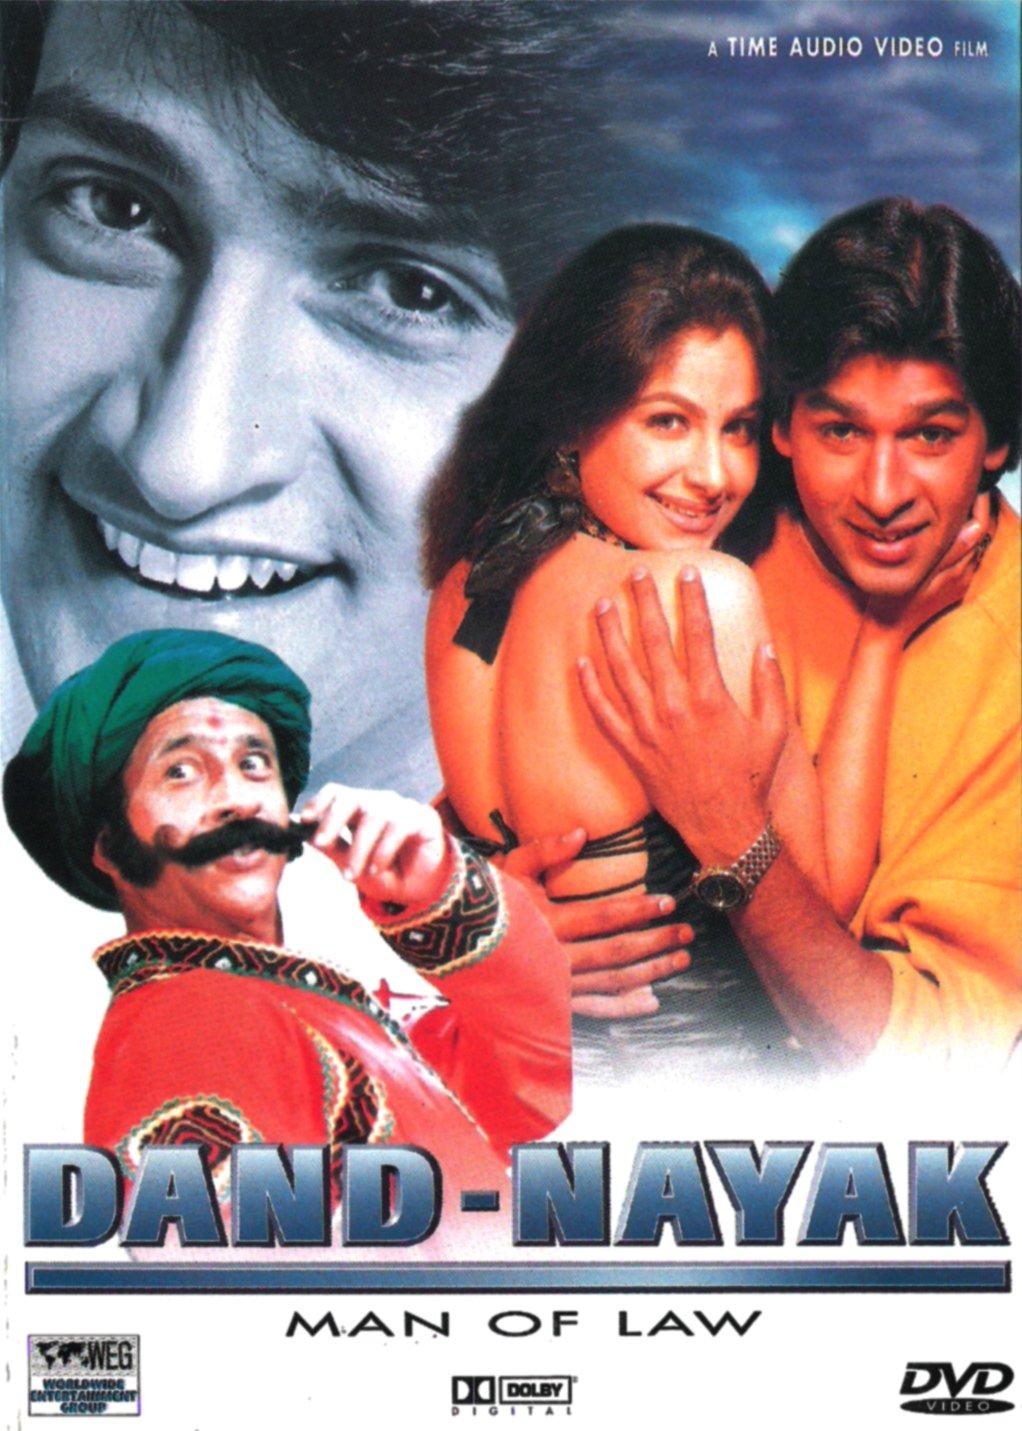 Dand Nayak (1998) SL YT - Manek Bedi, Ayesha Jhulka, Bharat Kapoor